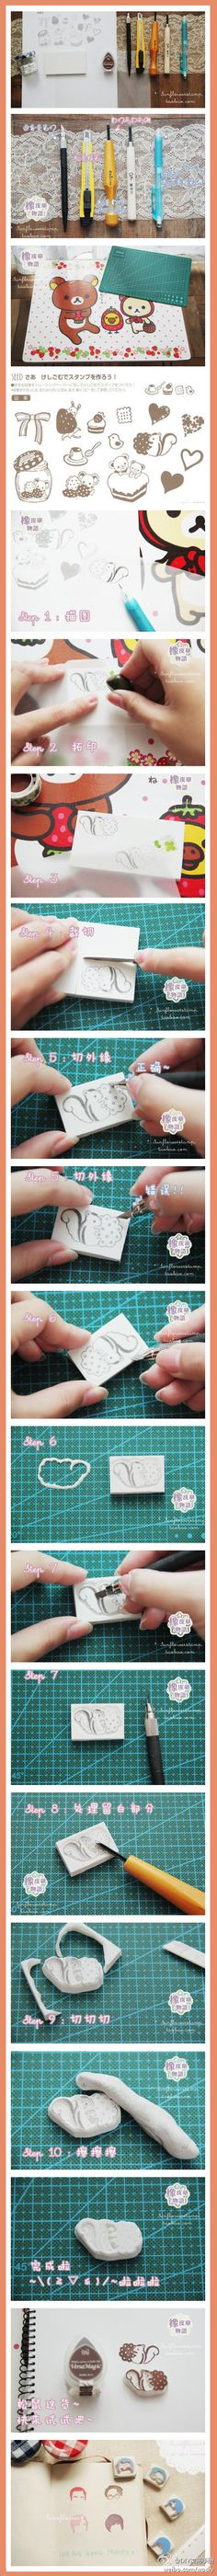 DIY Eraser Stamp Tutorial